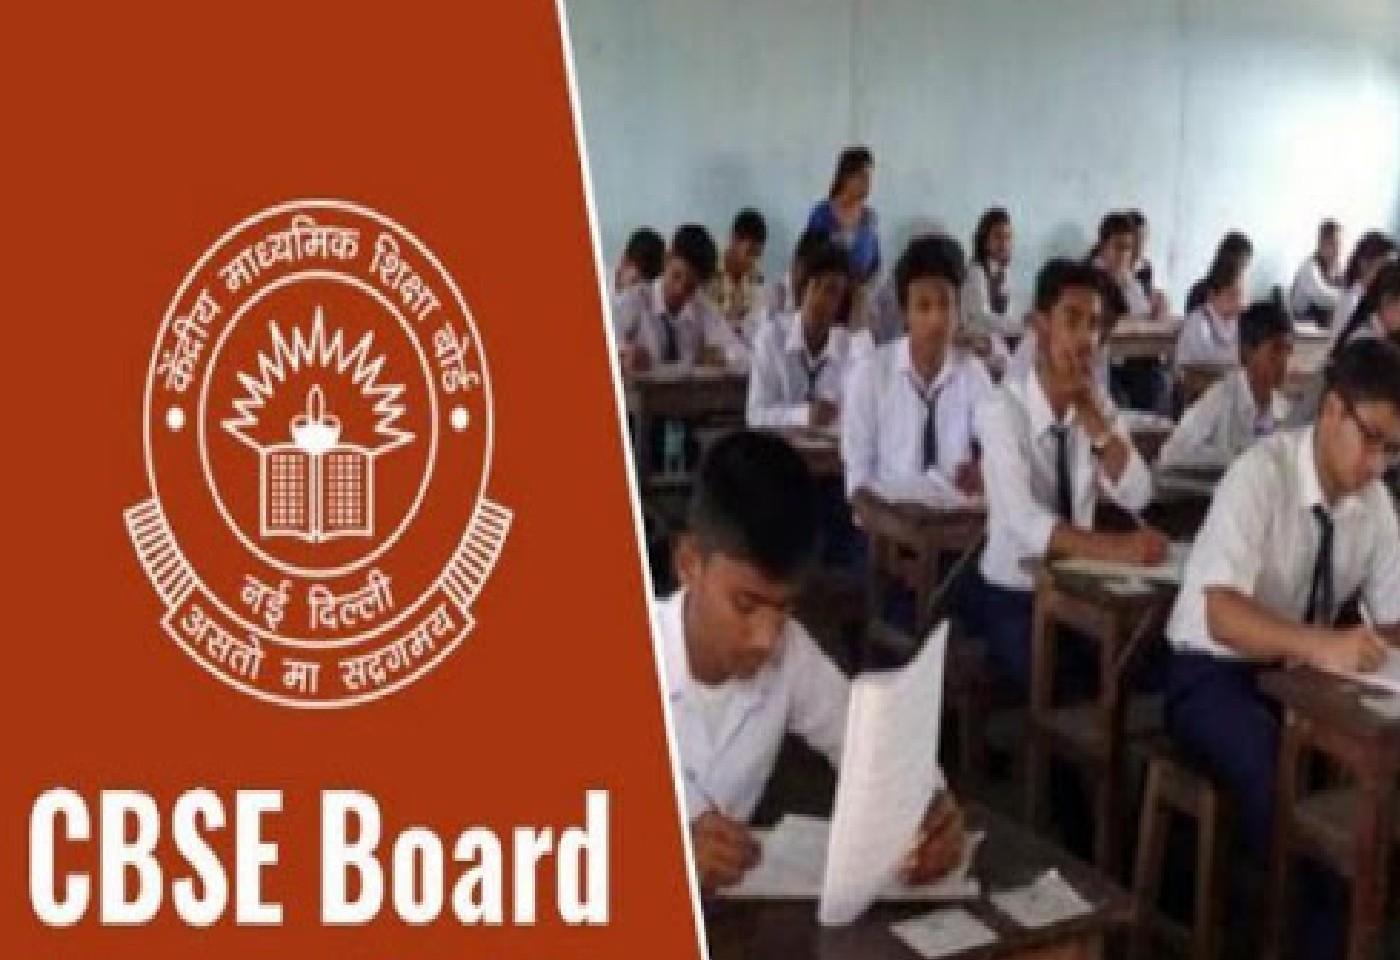 CBSE Board Exam 2021: CBSE 12th exam postponed, 10th exam canceled